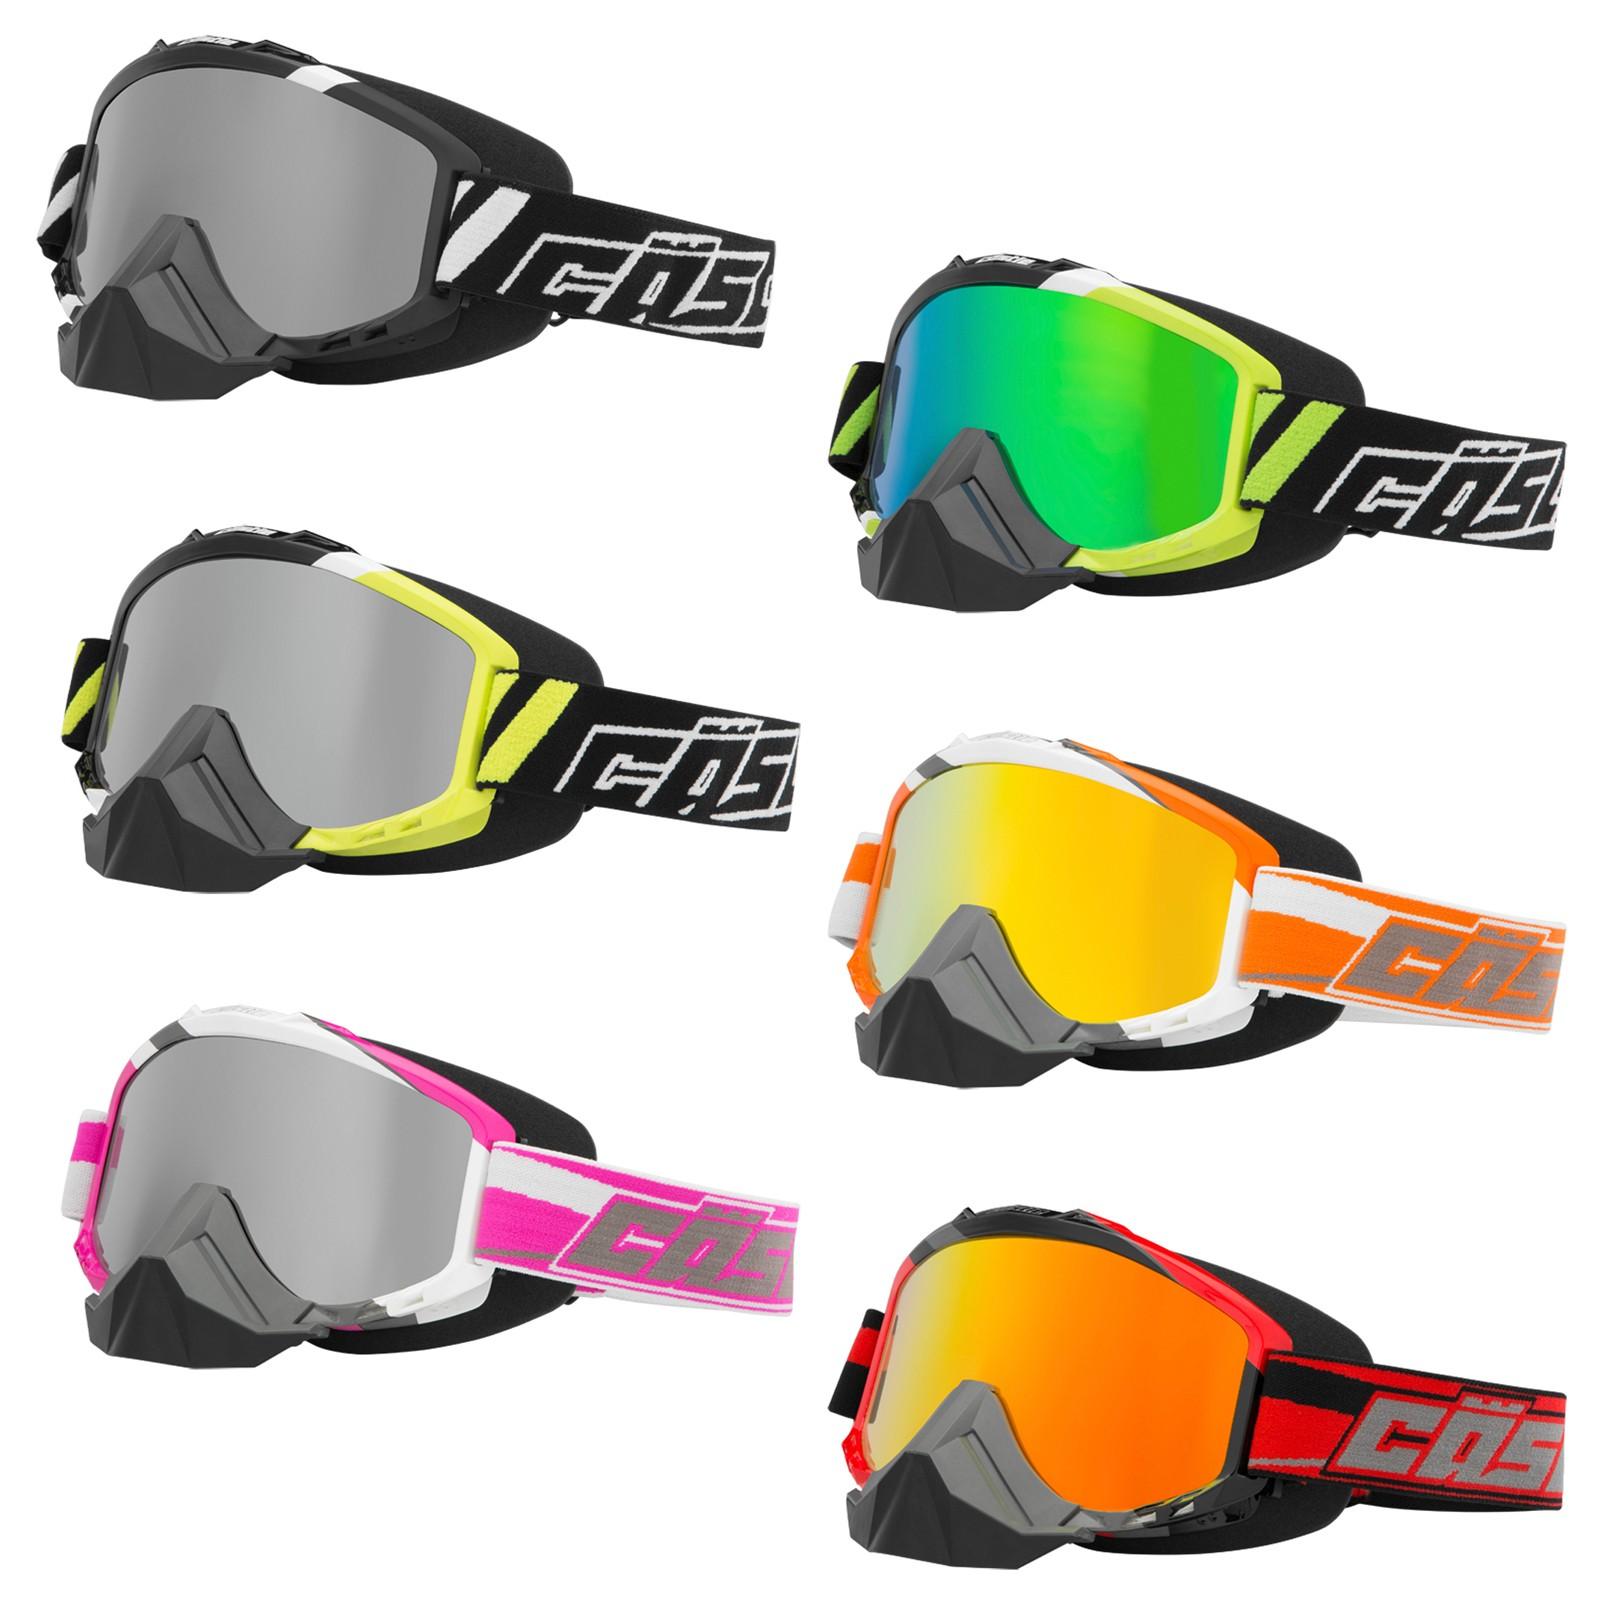 Castle Eyewear Force SE Snow Goggles X1 Green